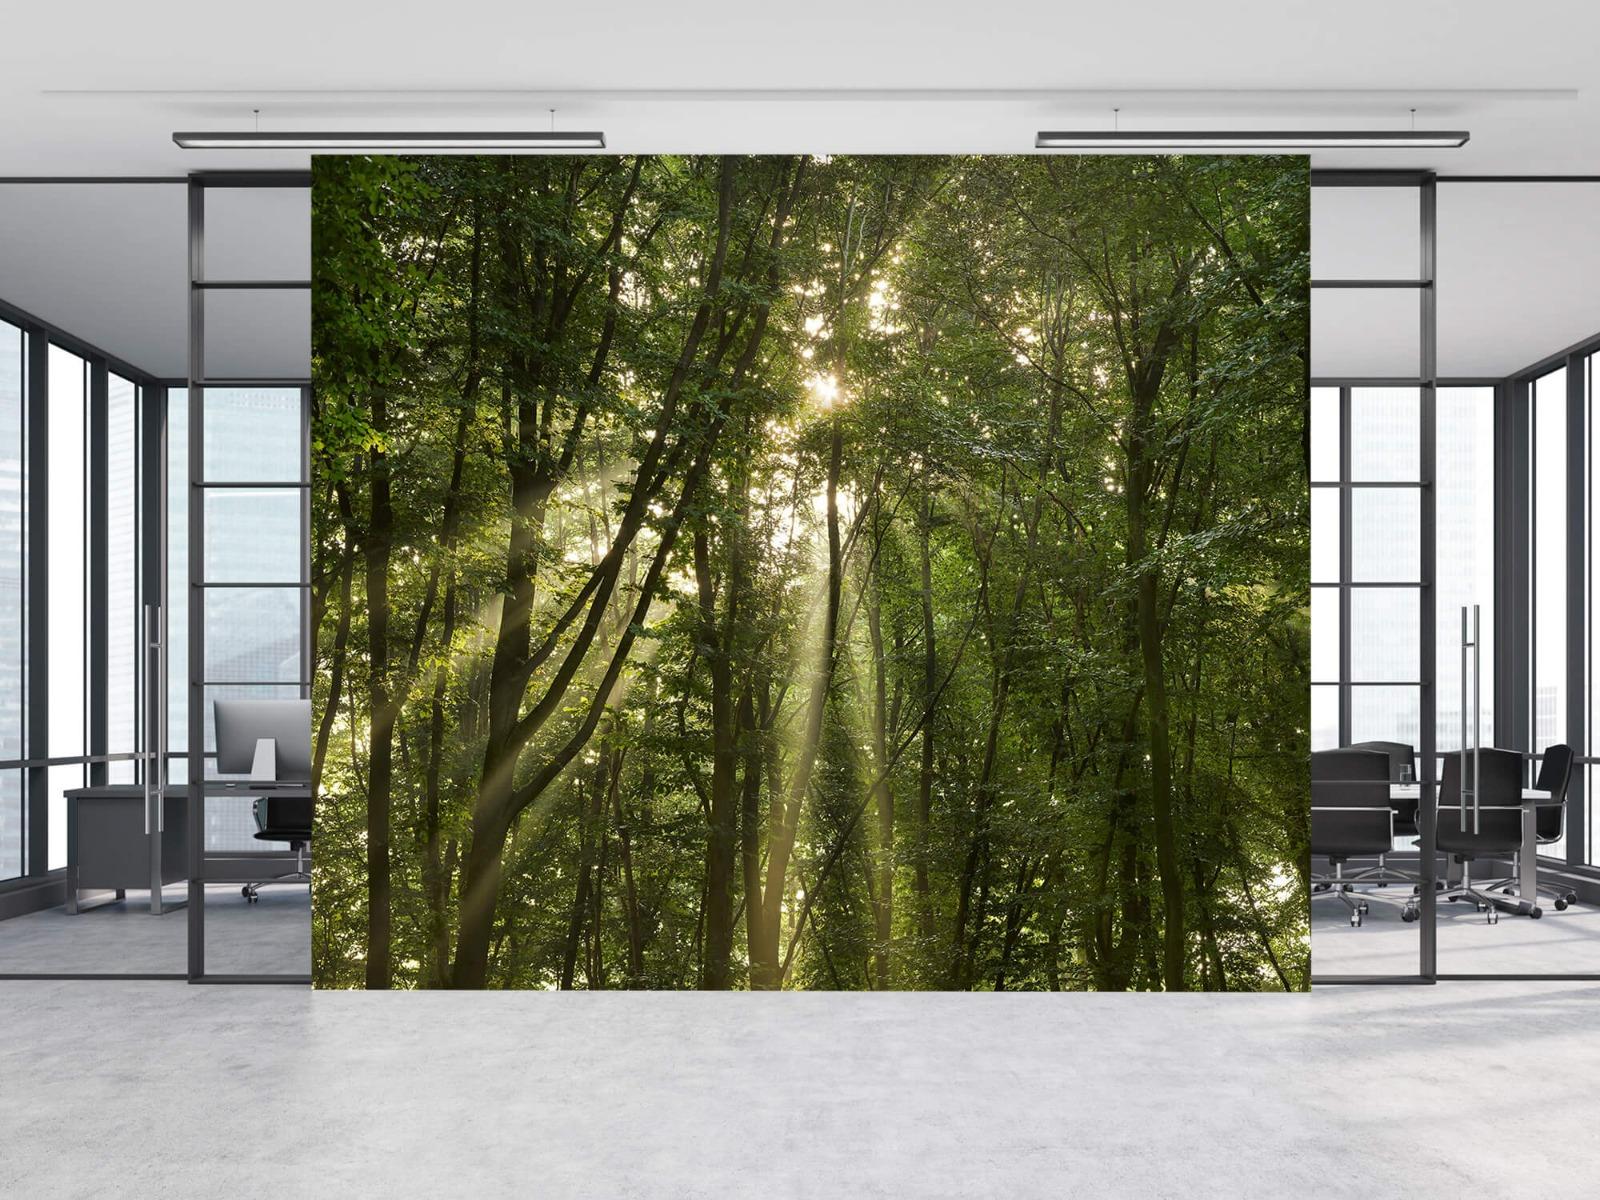 Bomen - Zonnestralen in het bos - Slaapkamer 8